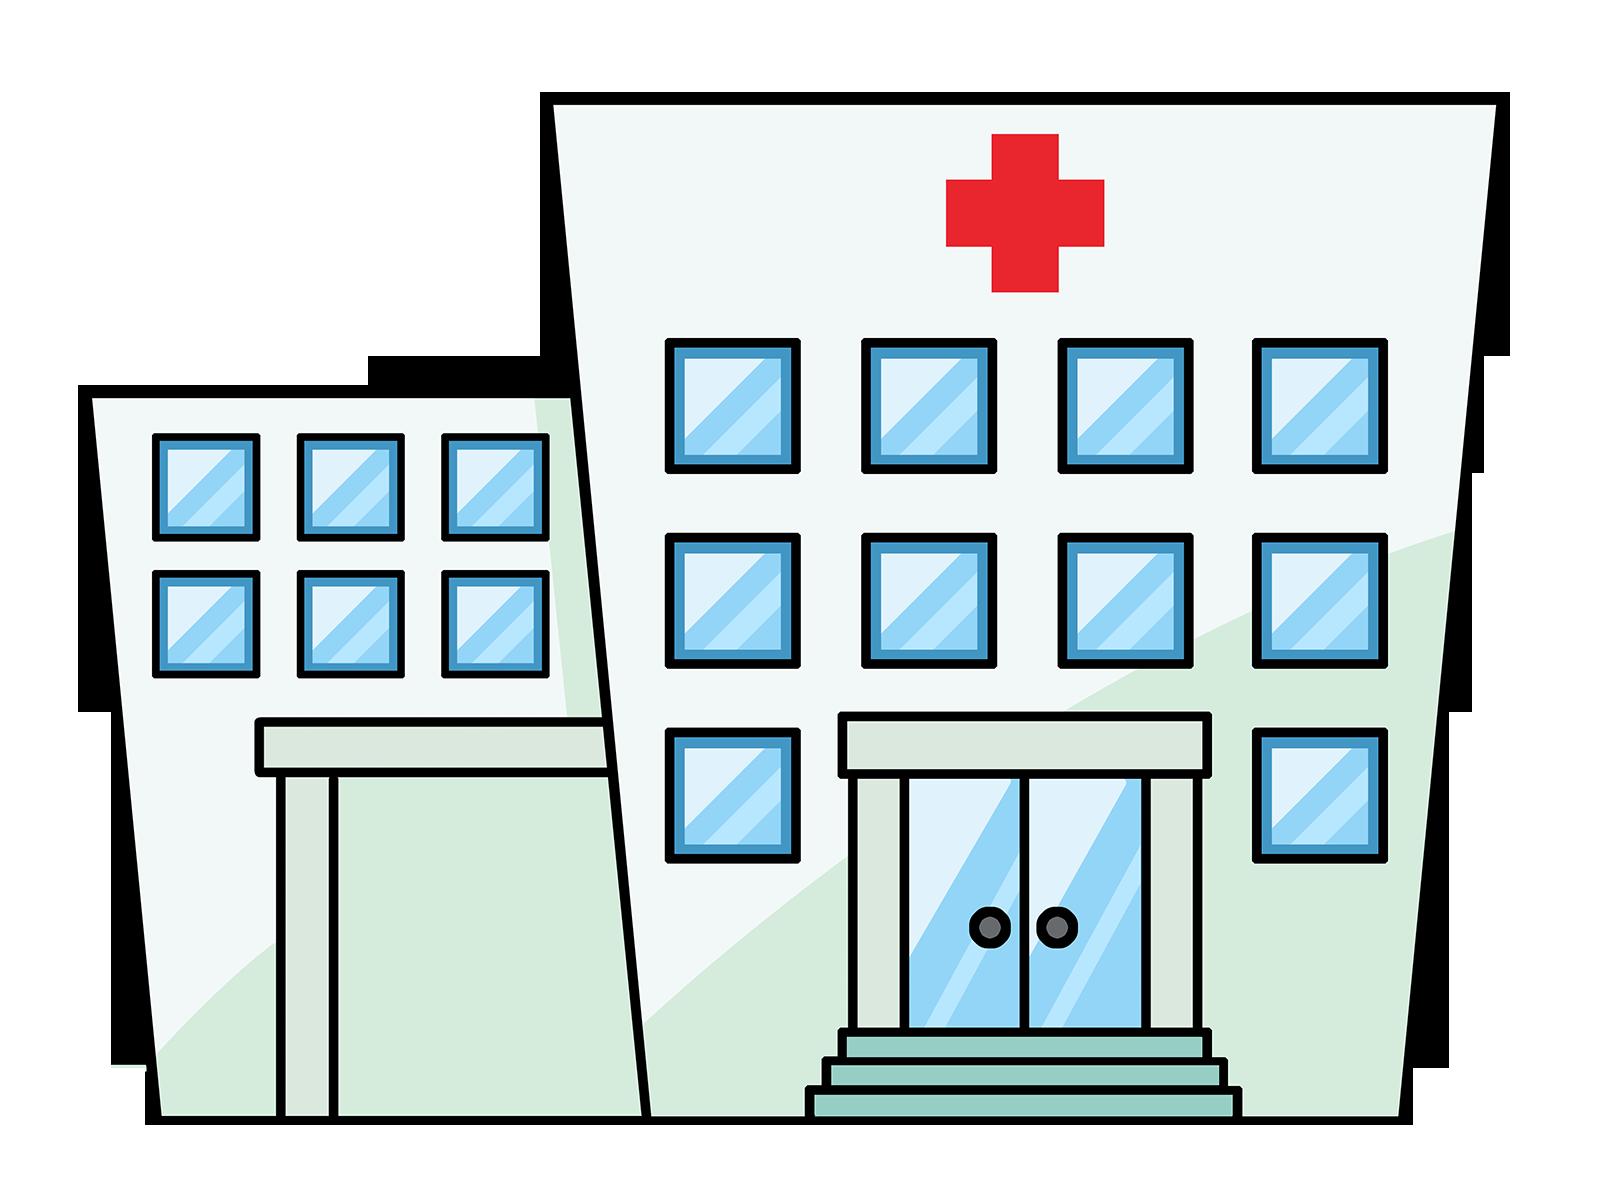 Hospital clipart hospital admission. Healthcare sustainability xoalliecatxo hospitalcliparthospital